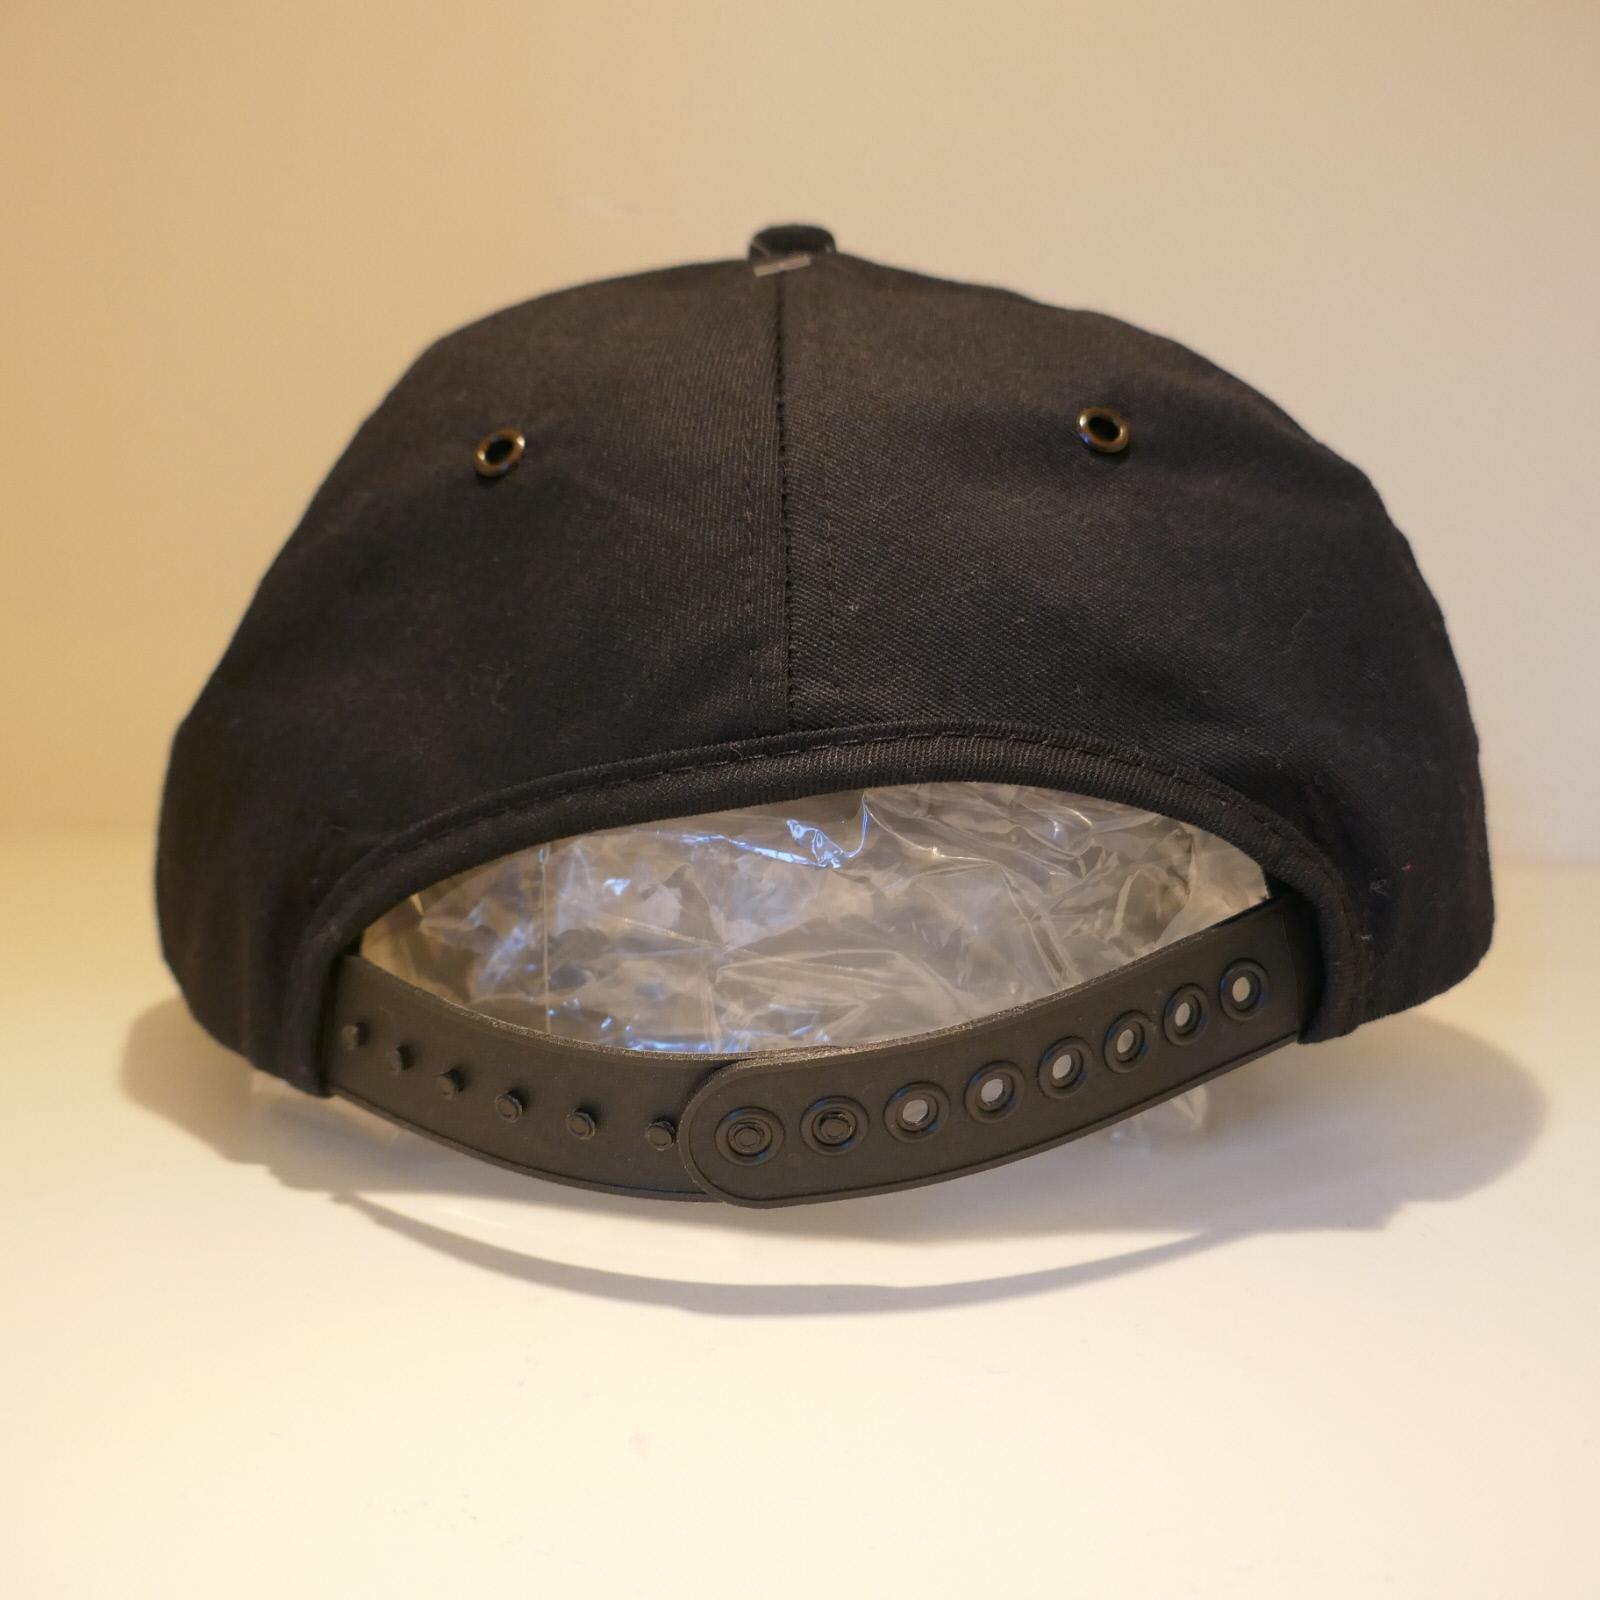 USED DELCON CAP BLACK